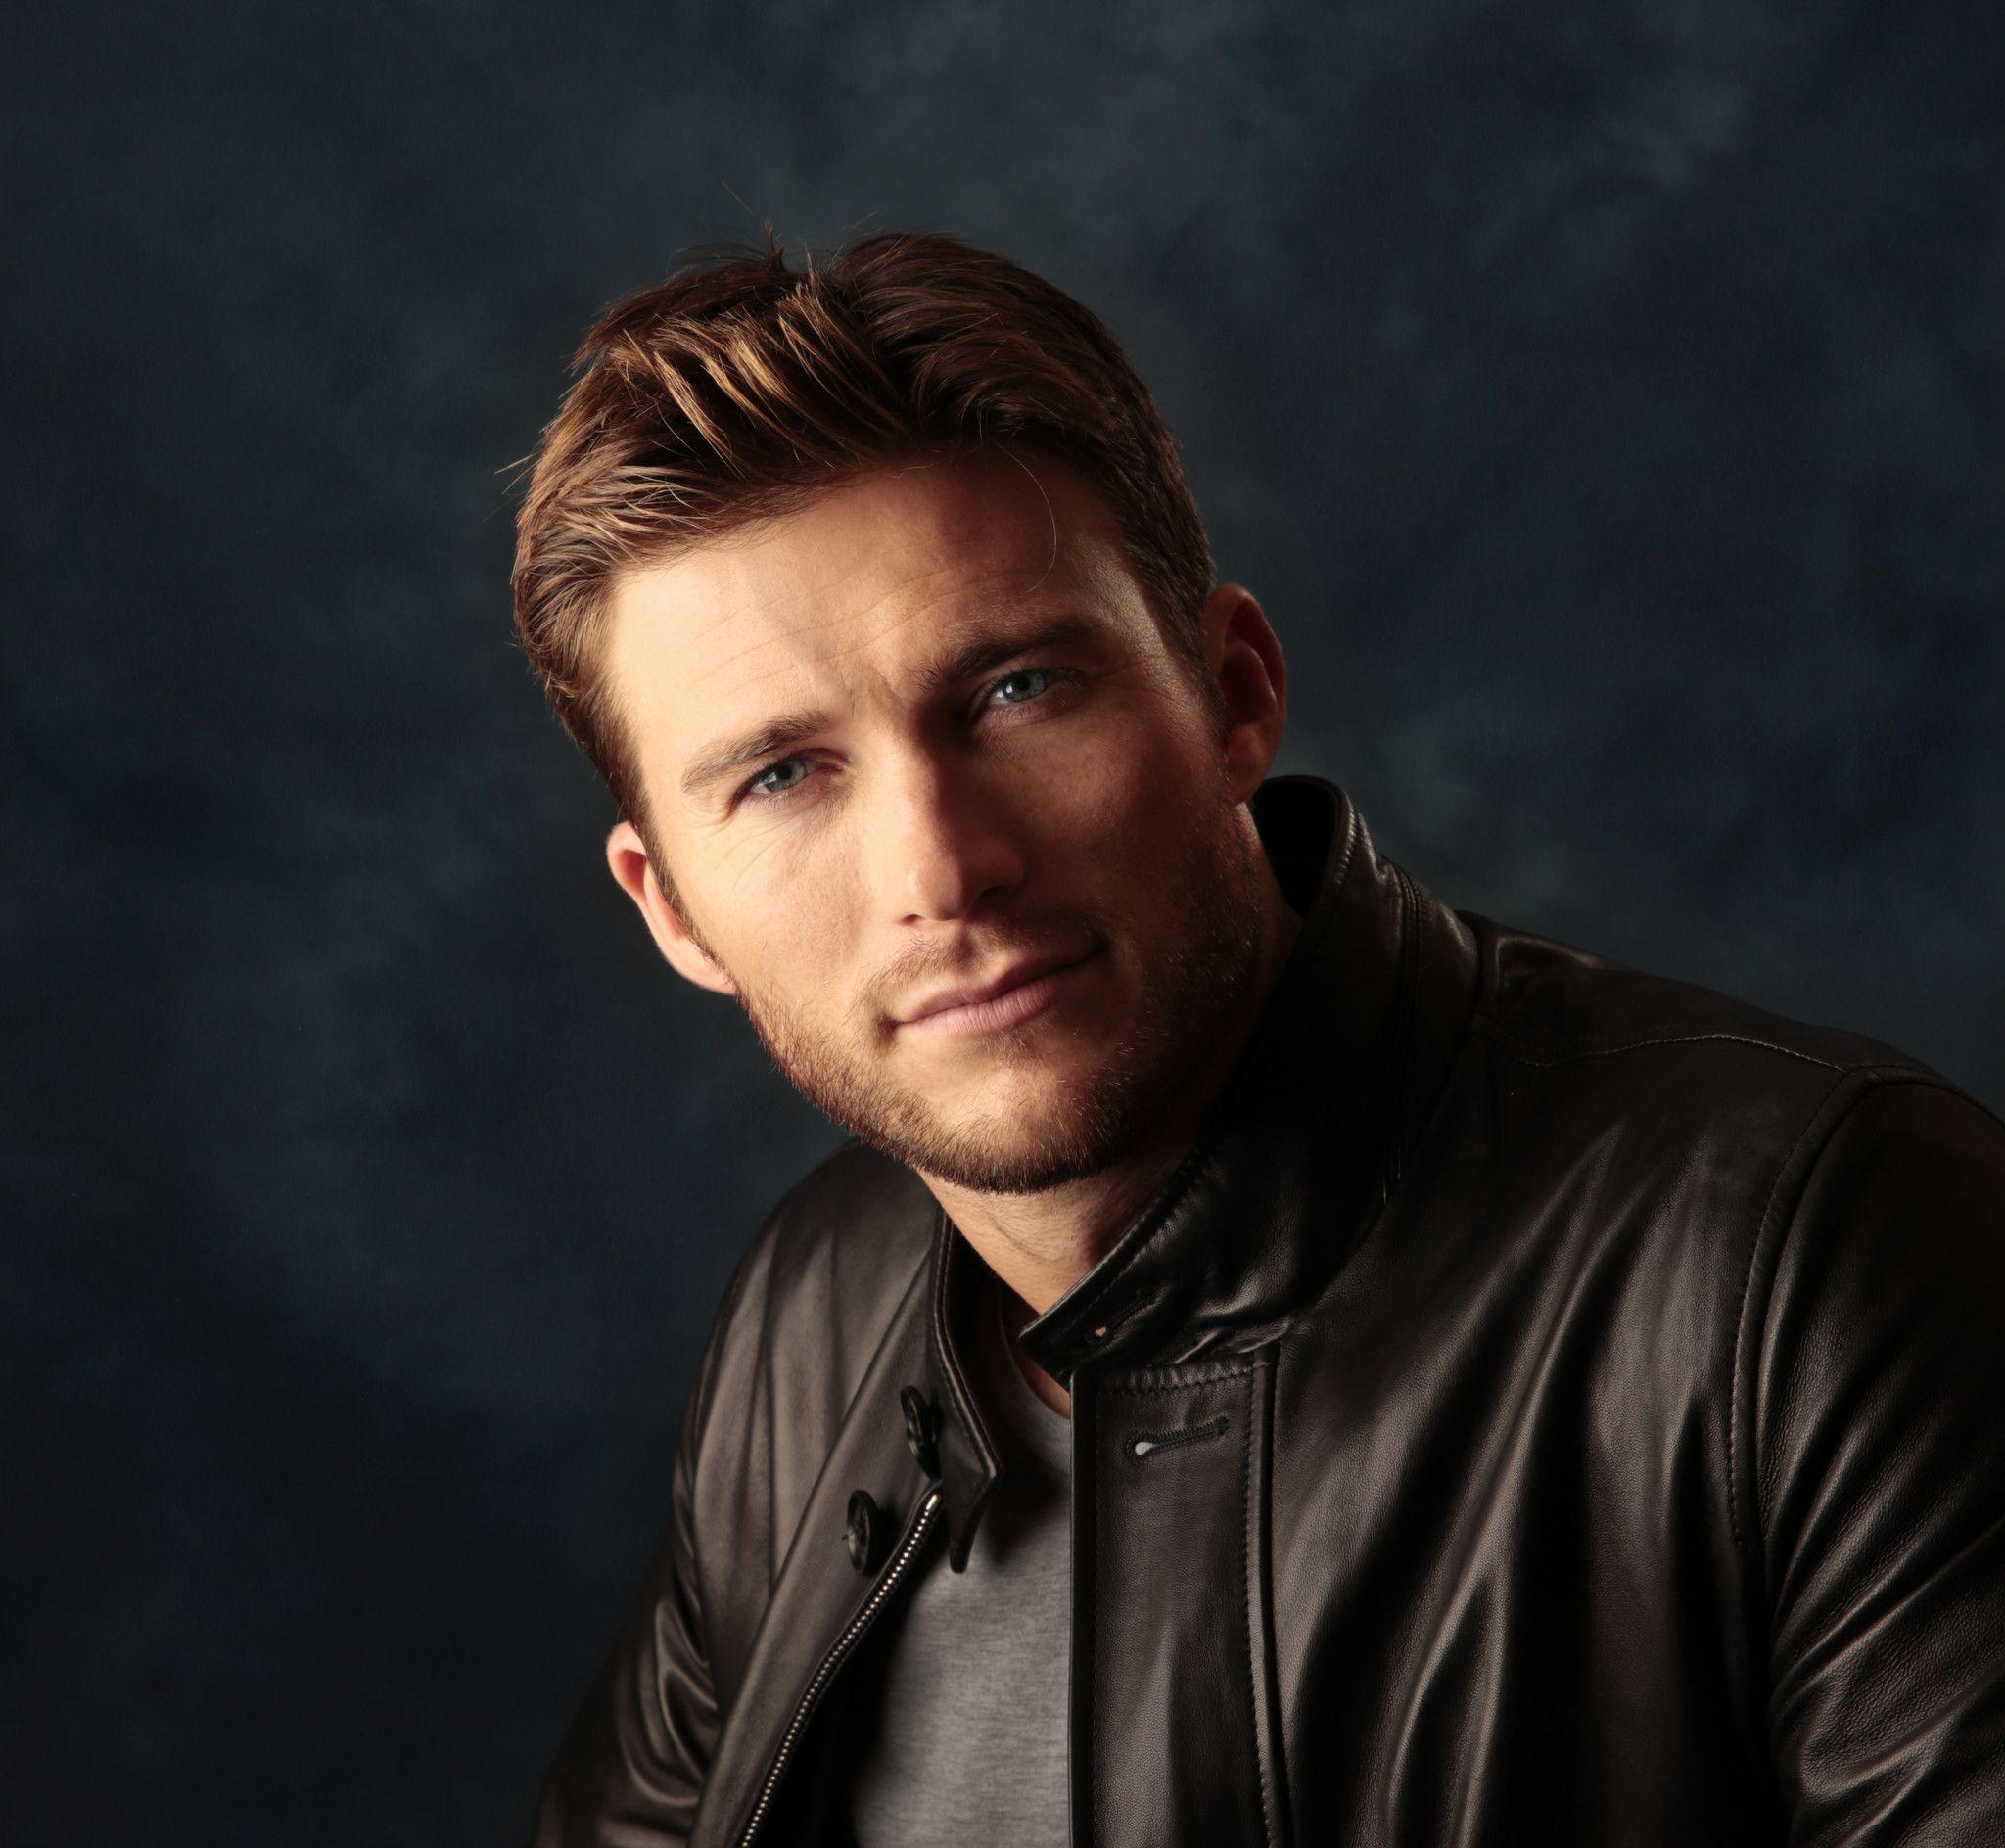 Scott Eastwood: Ashton Kutcher cheated on Demi Moore with my girlfriend